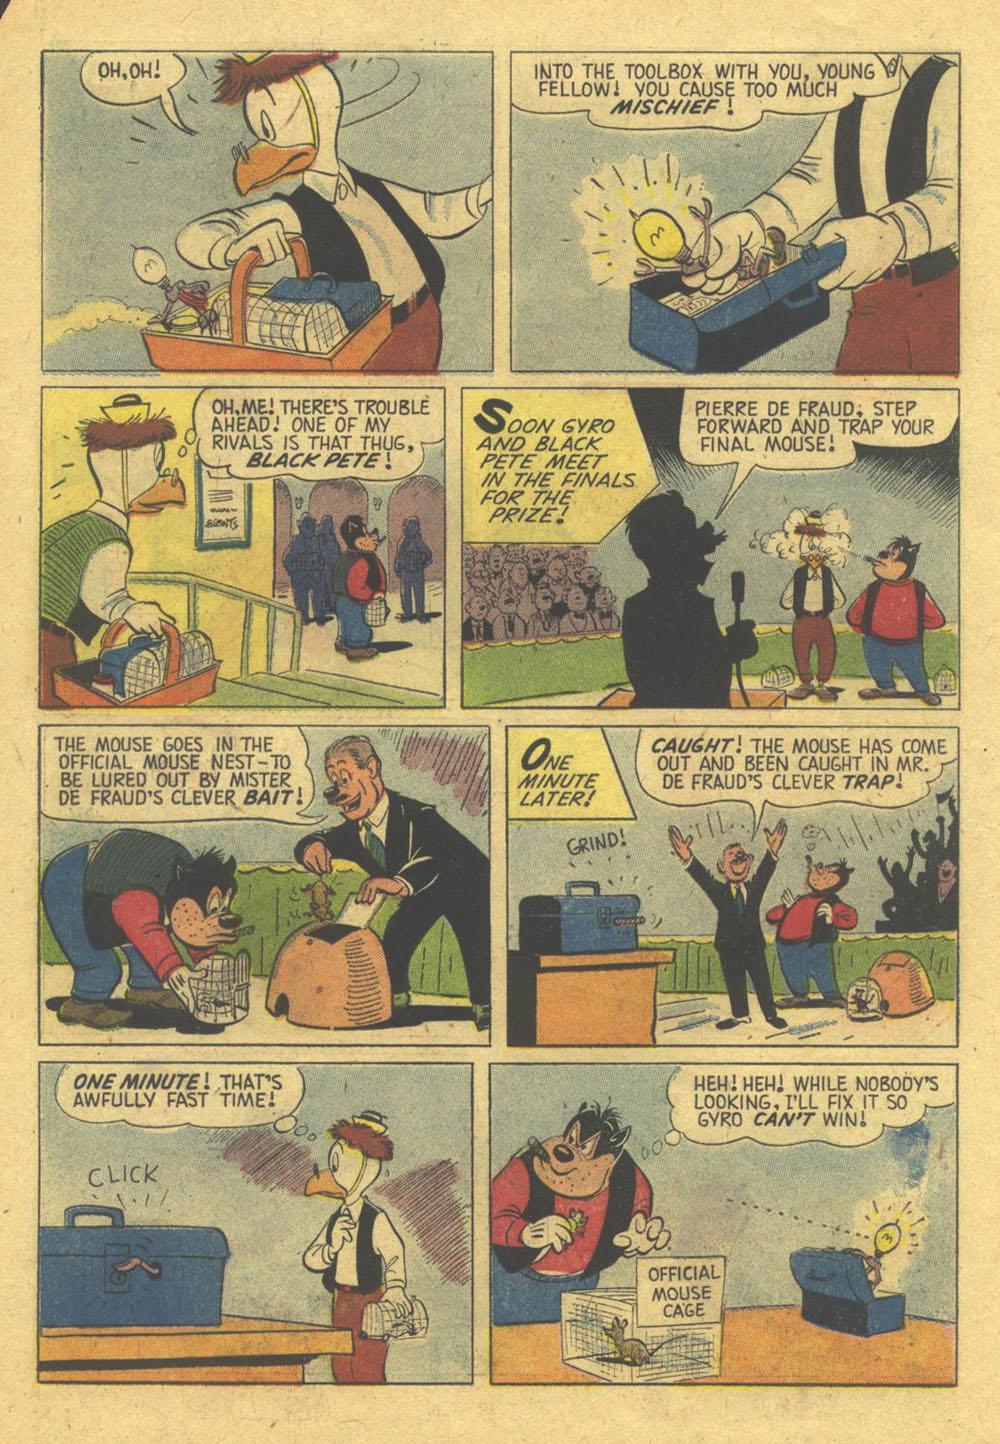 comiconlinefree.com/uncl #377 - English 26